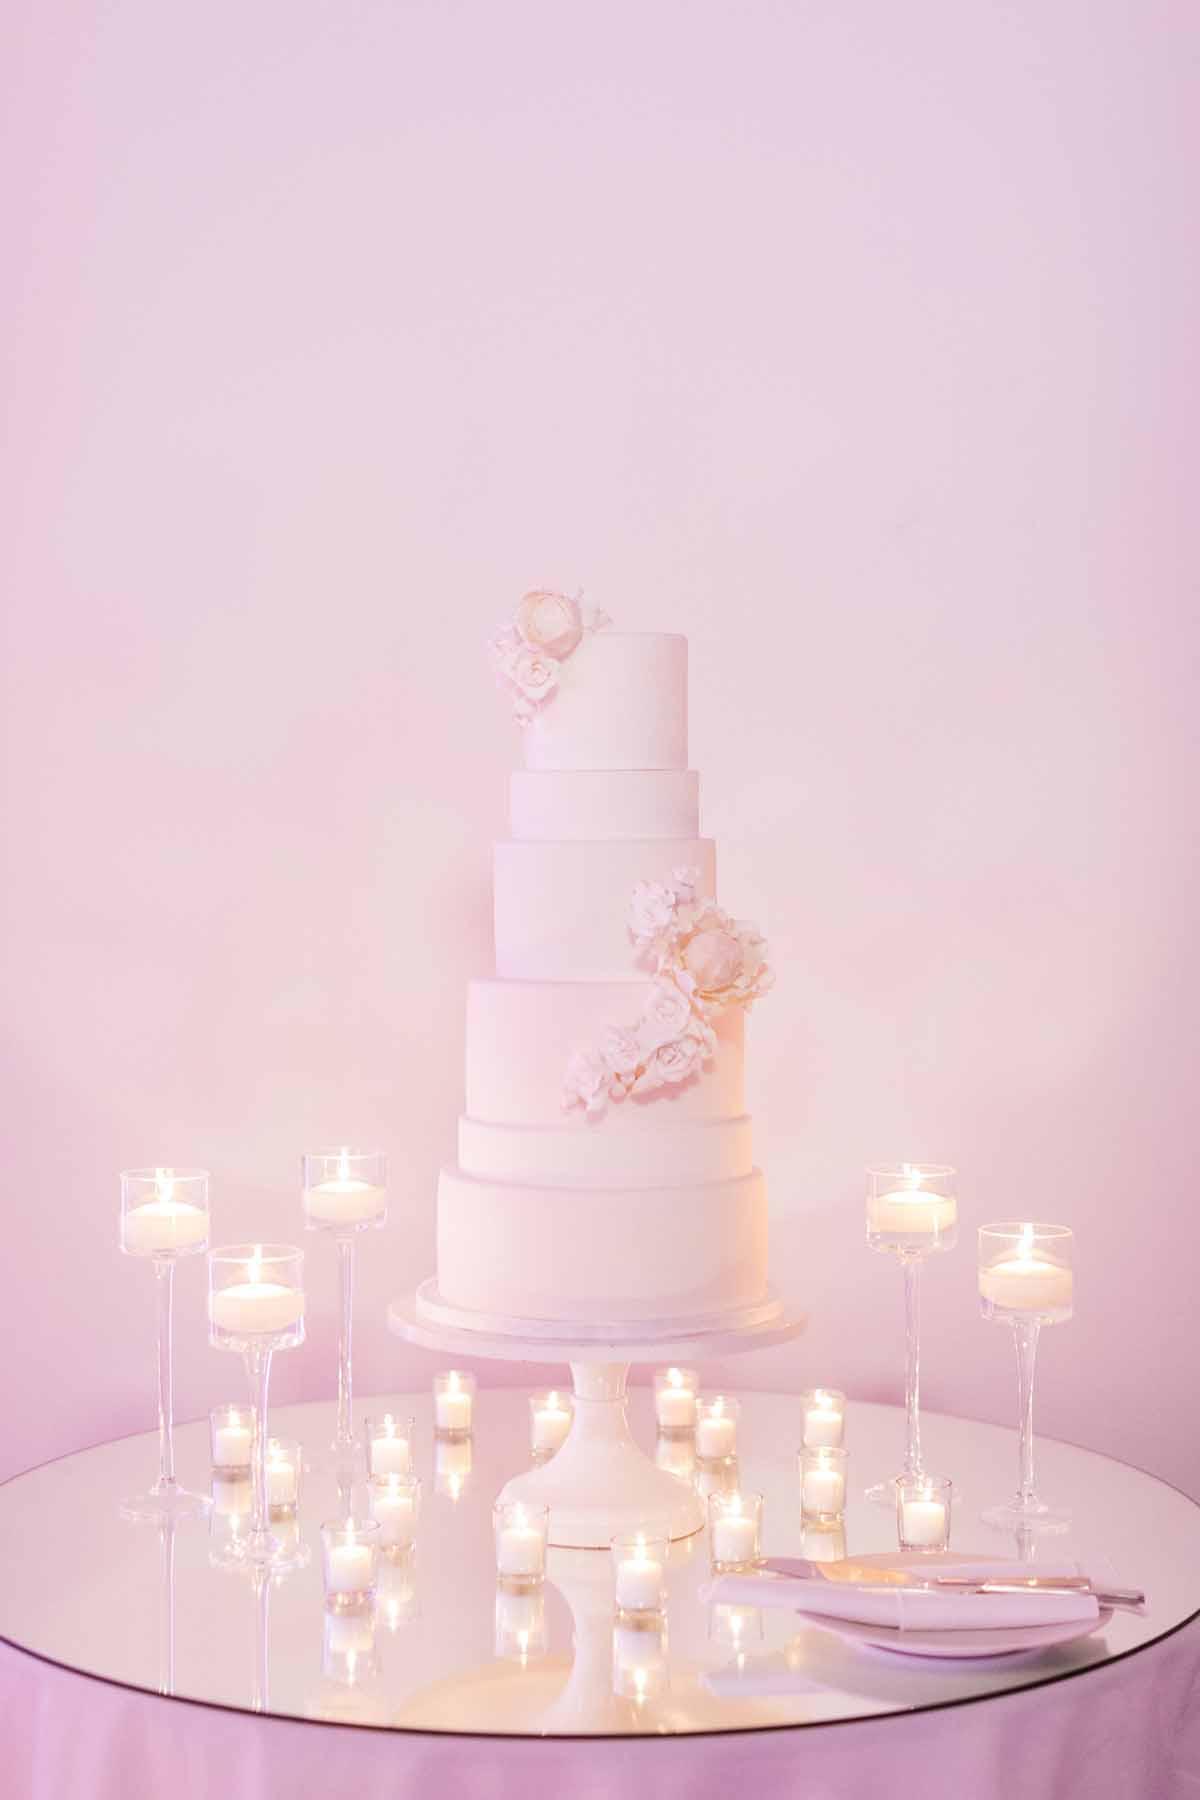 All white wedding cake at modern wedding